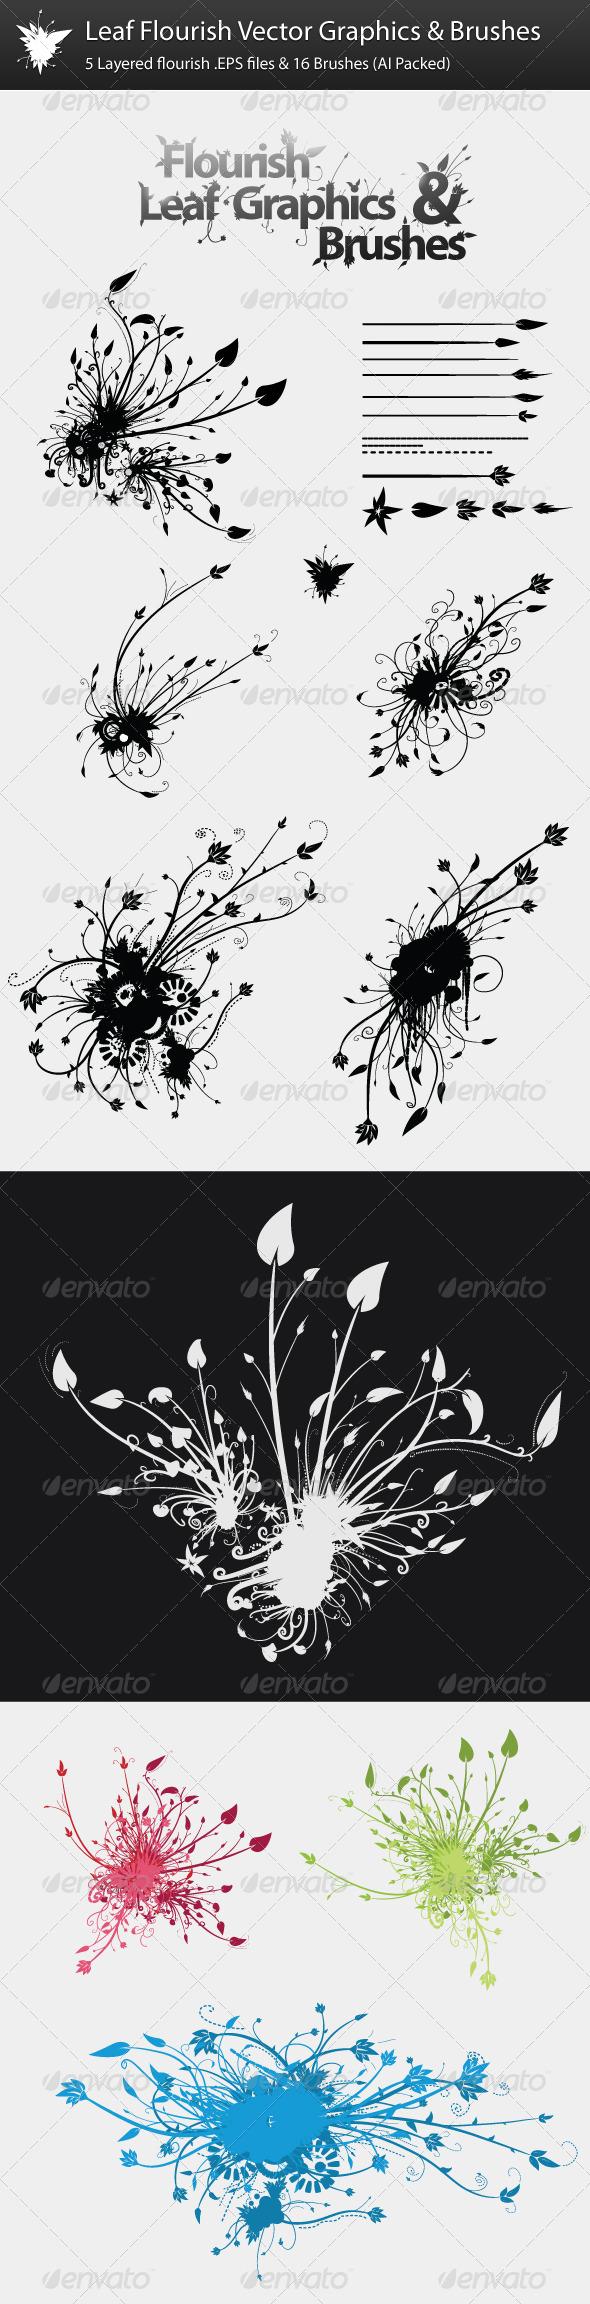 GraphicRiver Leaf Flourish Vector Graphics & Brushes 162072